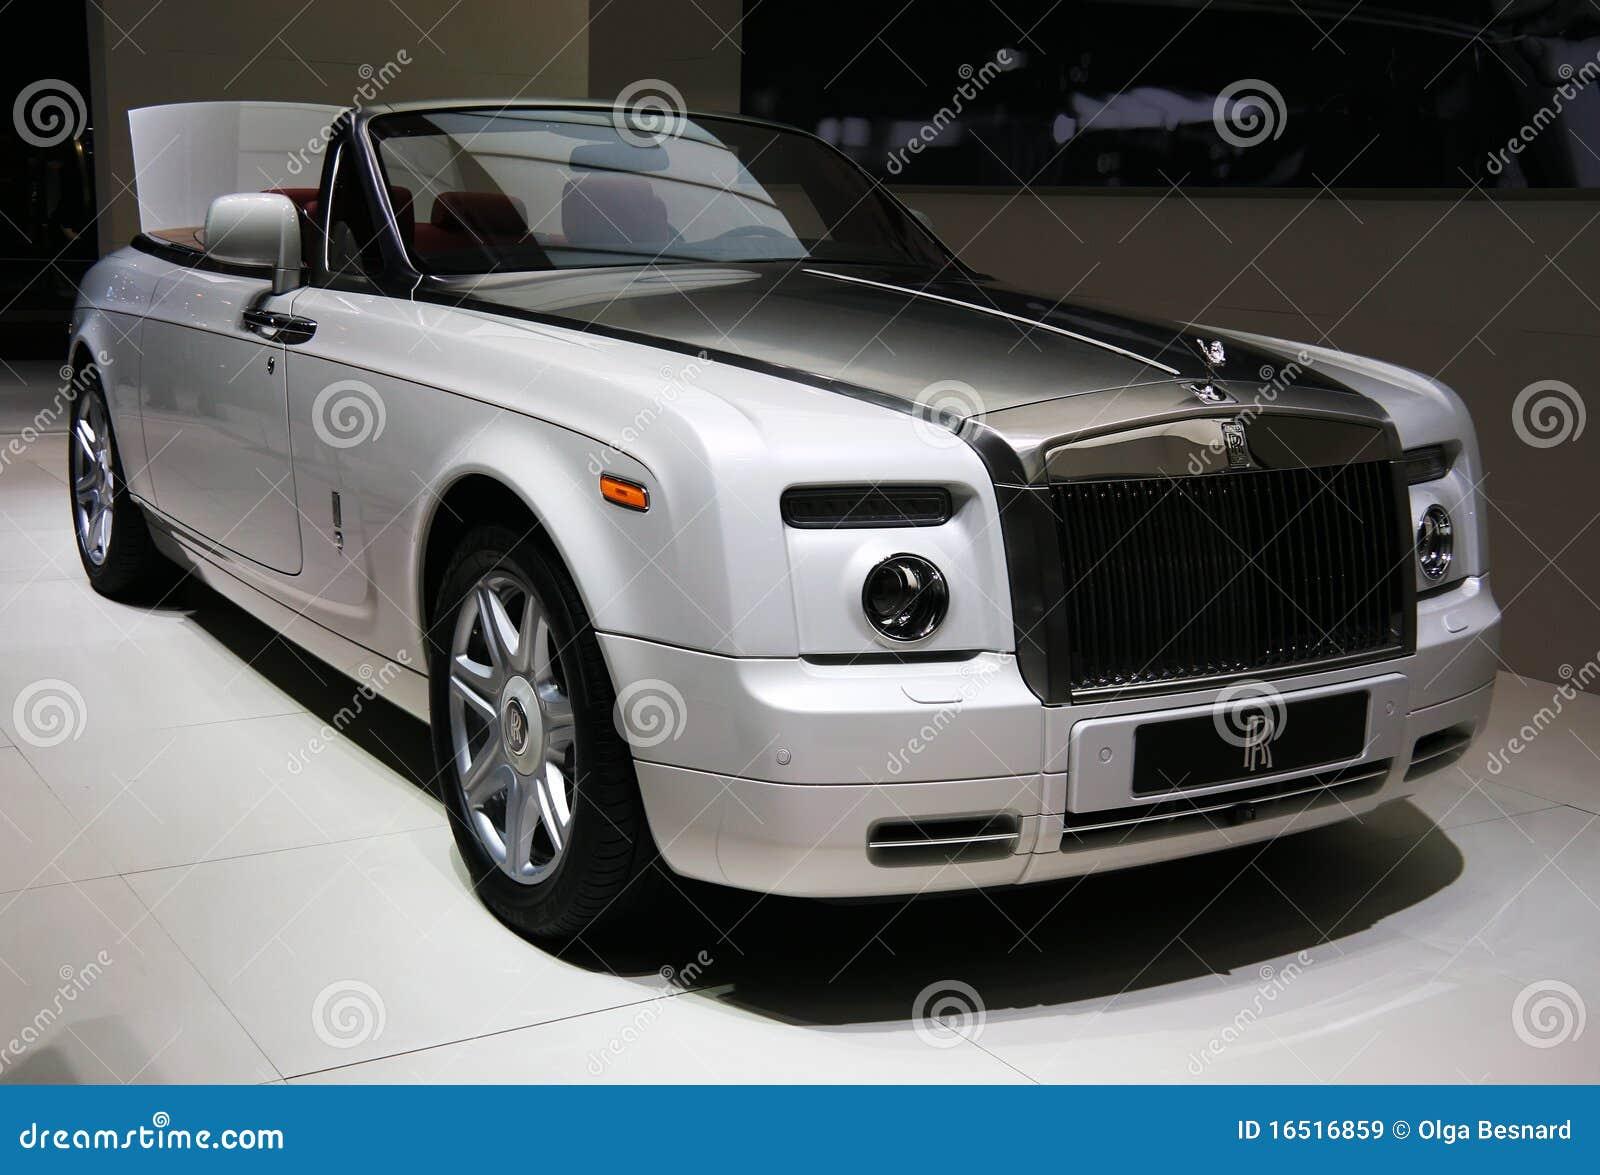 Rolls Royce Phantom Drophead Coupe Editorial Stock Image Image Of Carrara Transportation 16516859